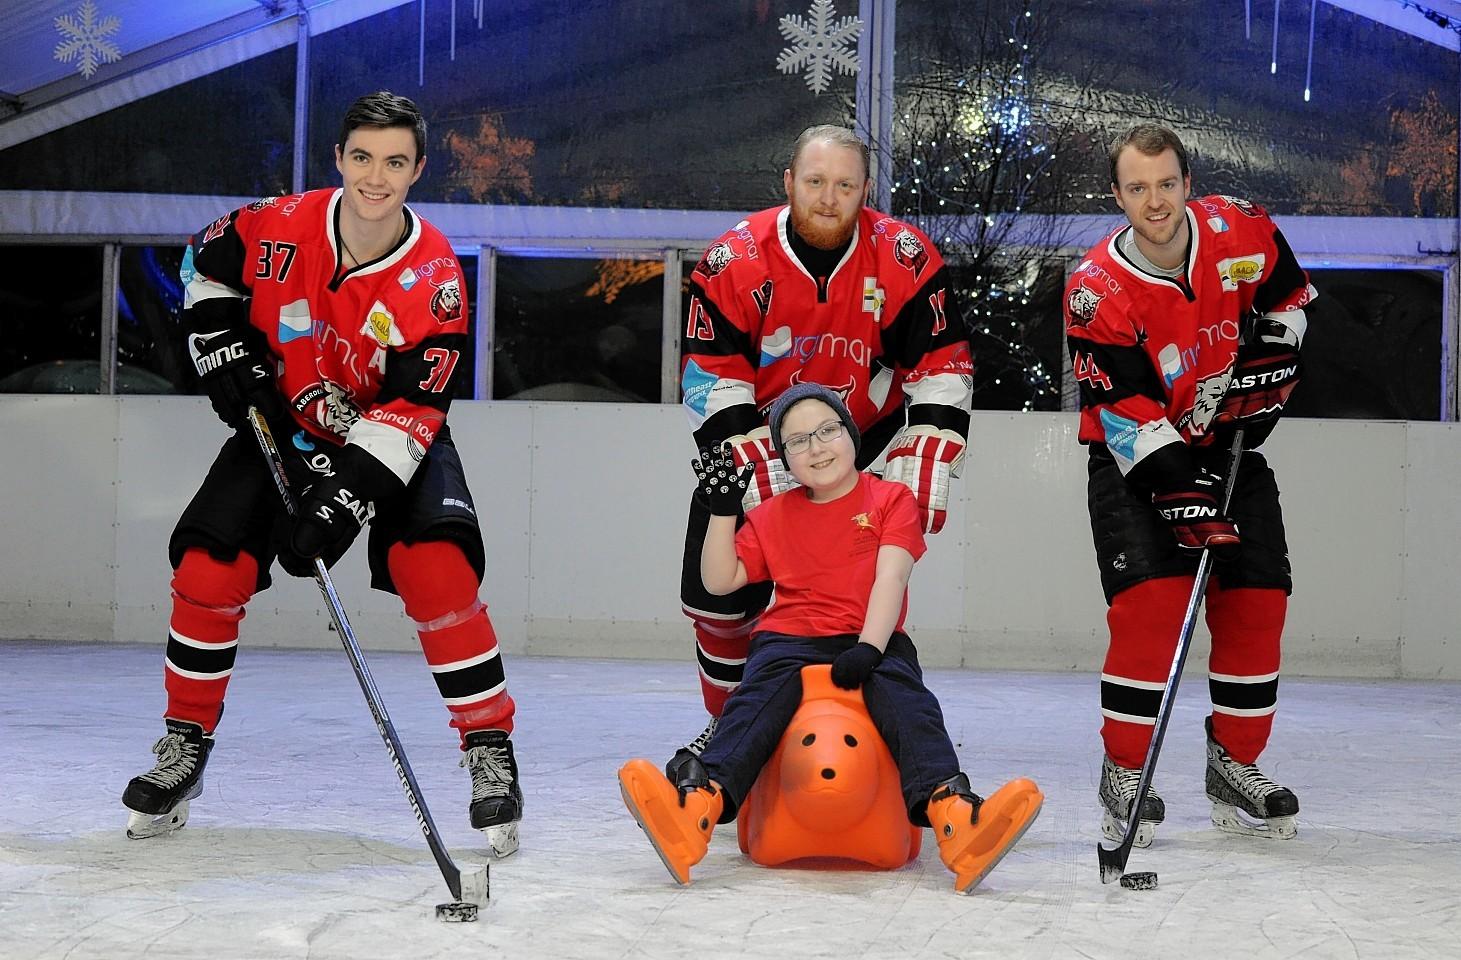 Aberdeen's Union Terrace Gardens ice rink